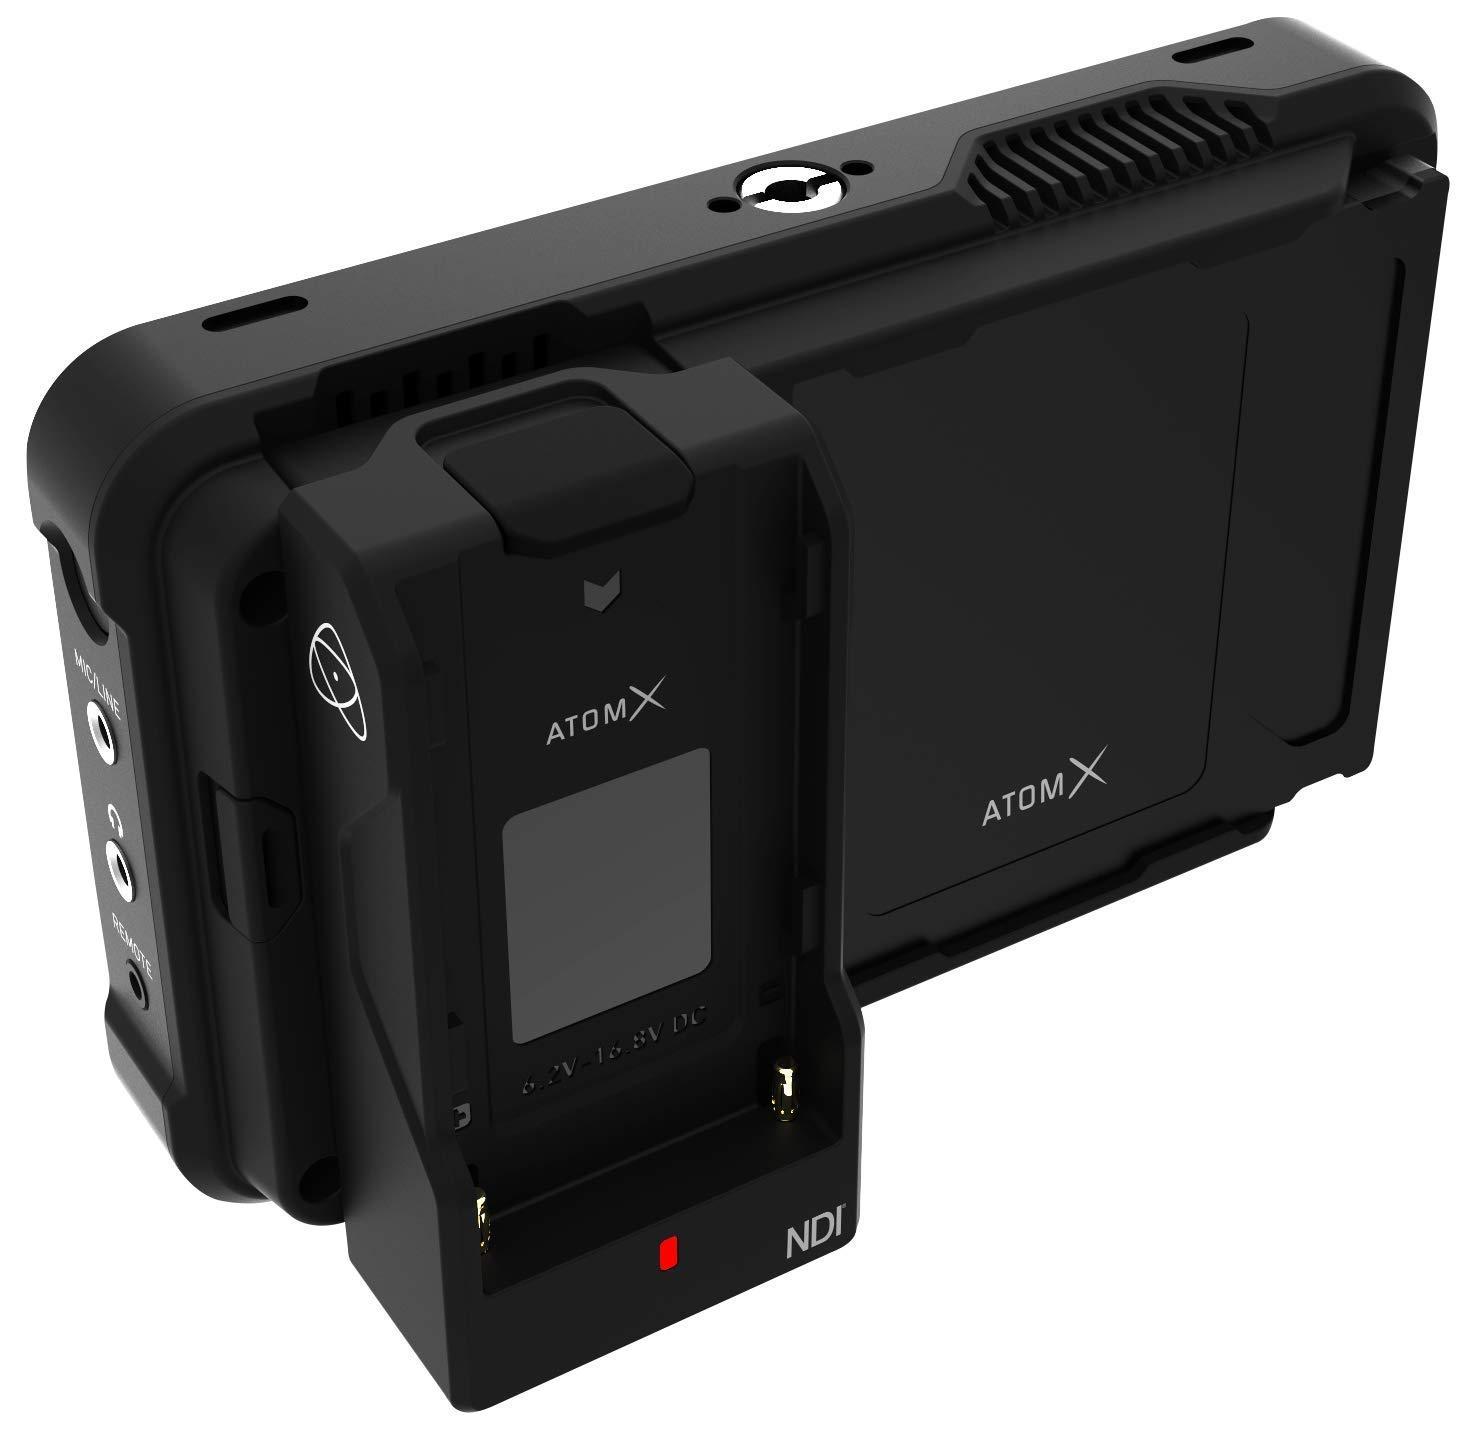 Atomos Ninja V 4Kp60 10bit HDR- Monitor de luz Diurna ...